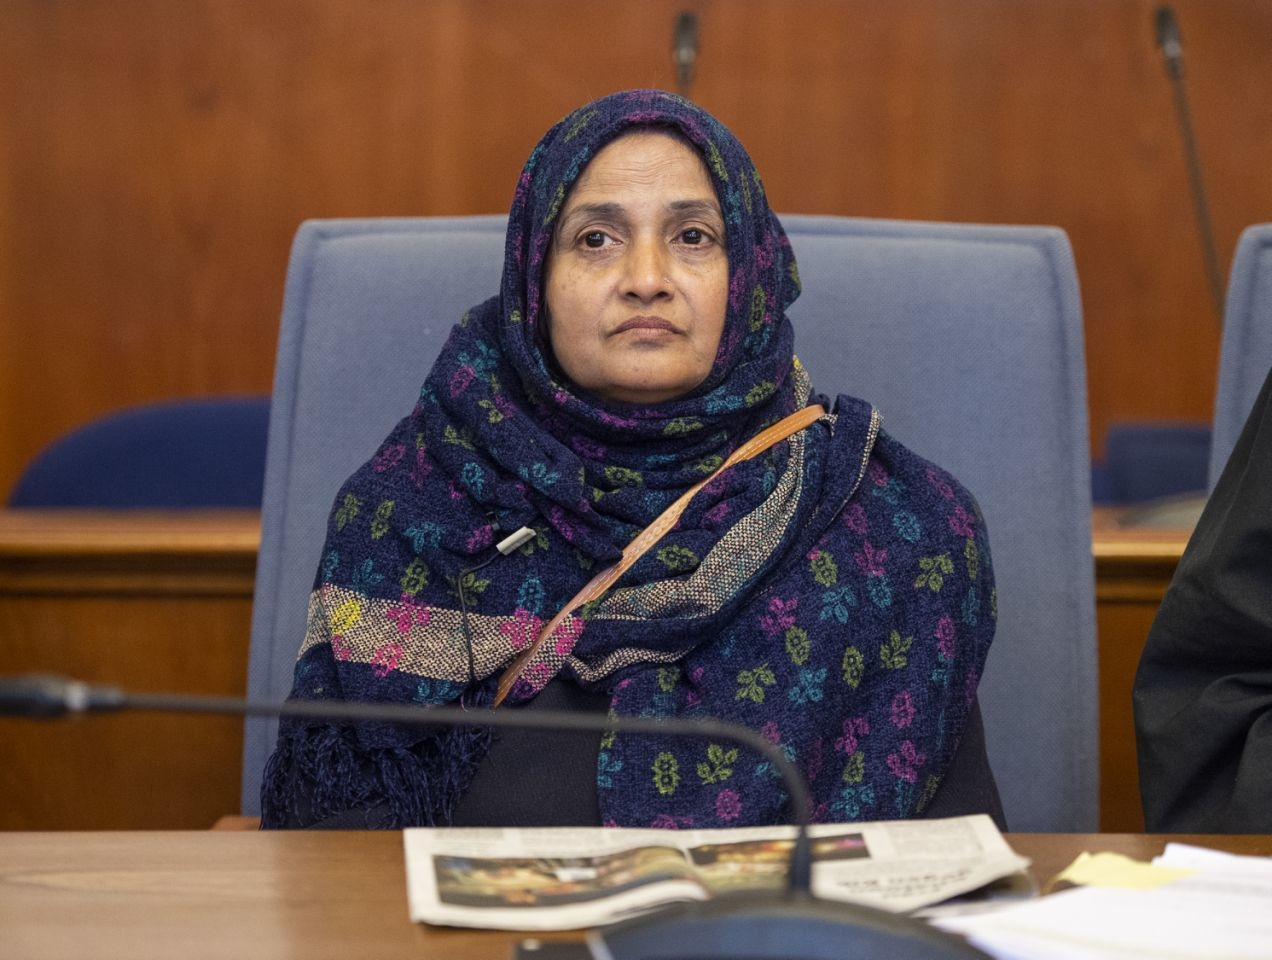 Saeeda Khatoon at a court in Dortmund | AP